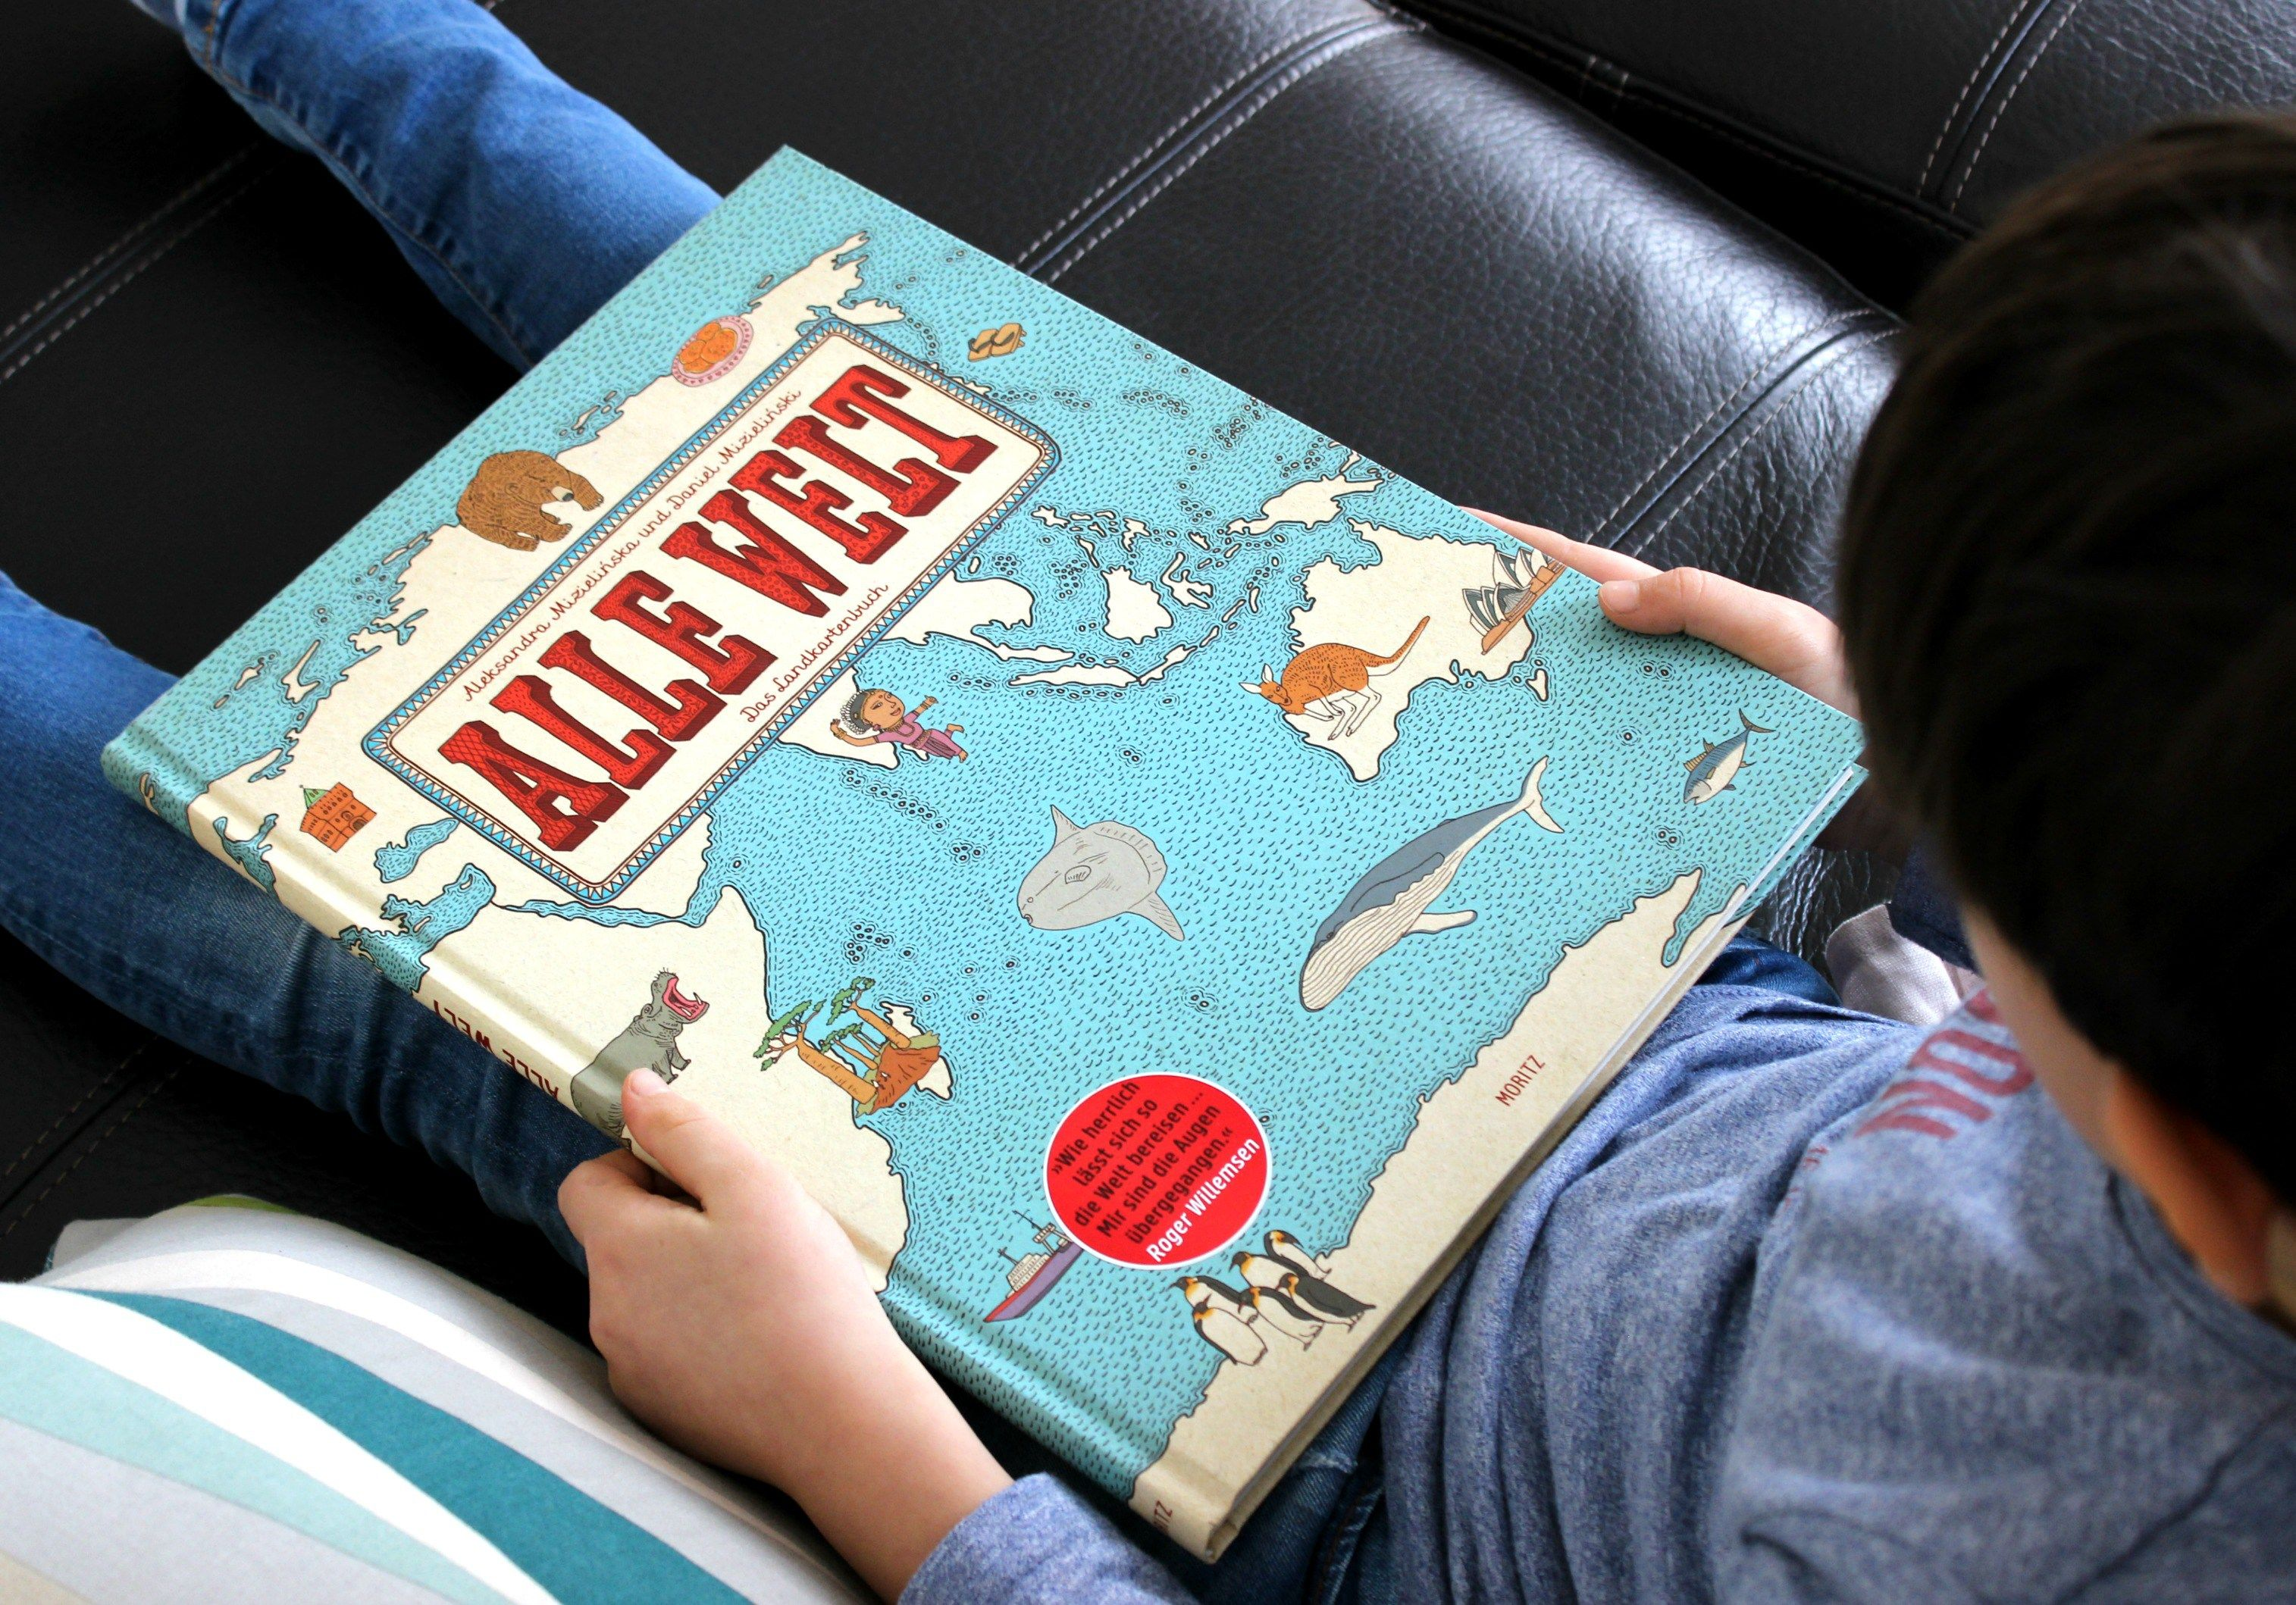 Lieblingsbücher / Kinderbücher auf  http://lifestylemommy.de/mama-talk-buecherliebe-aktuelle-lieblingsbuecher/